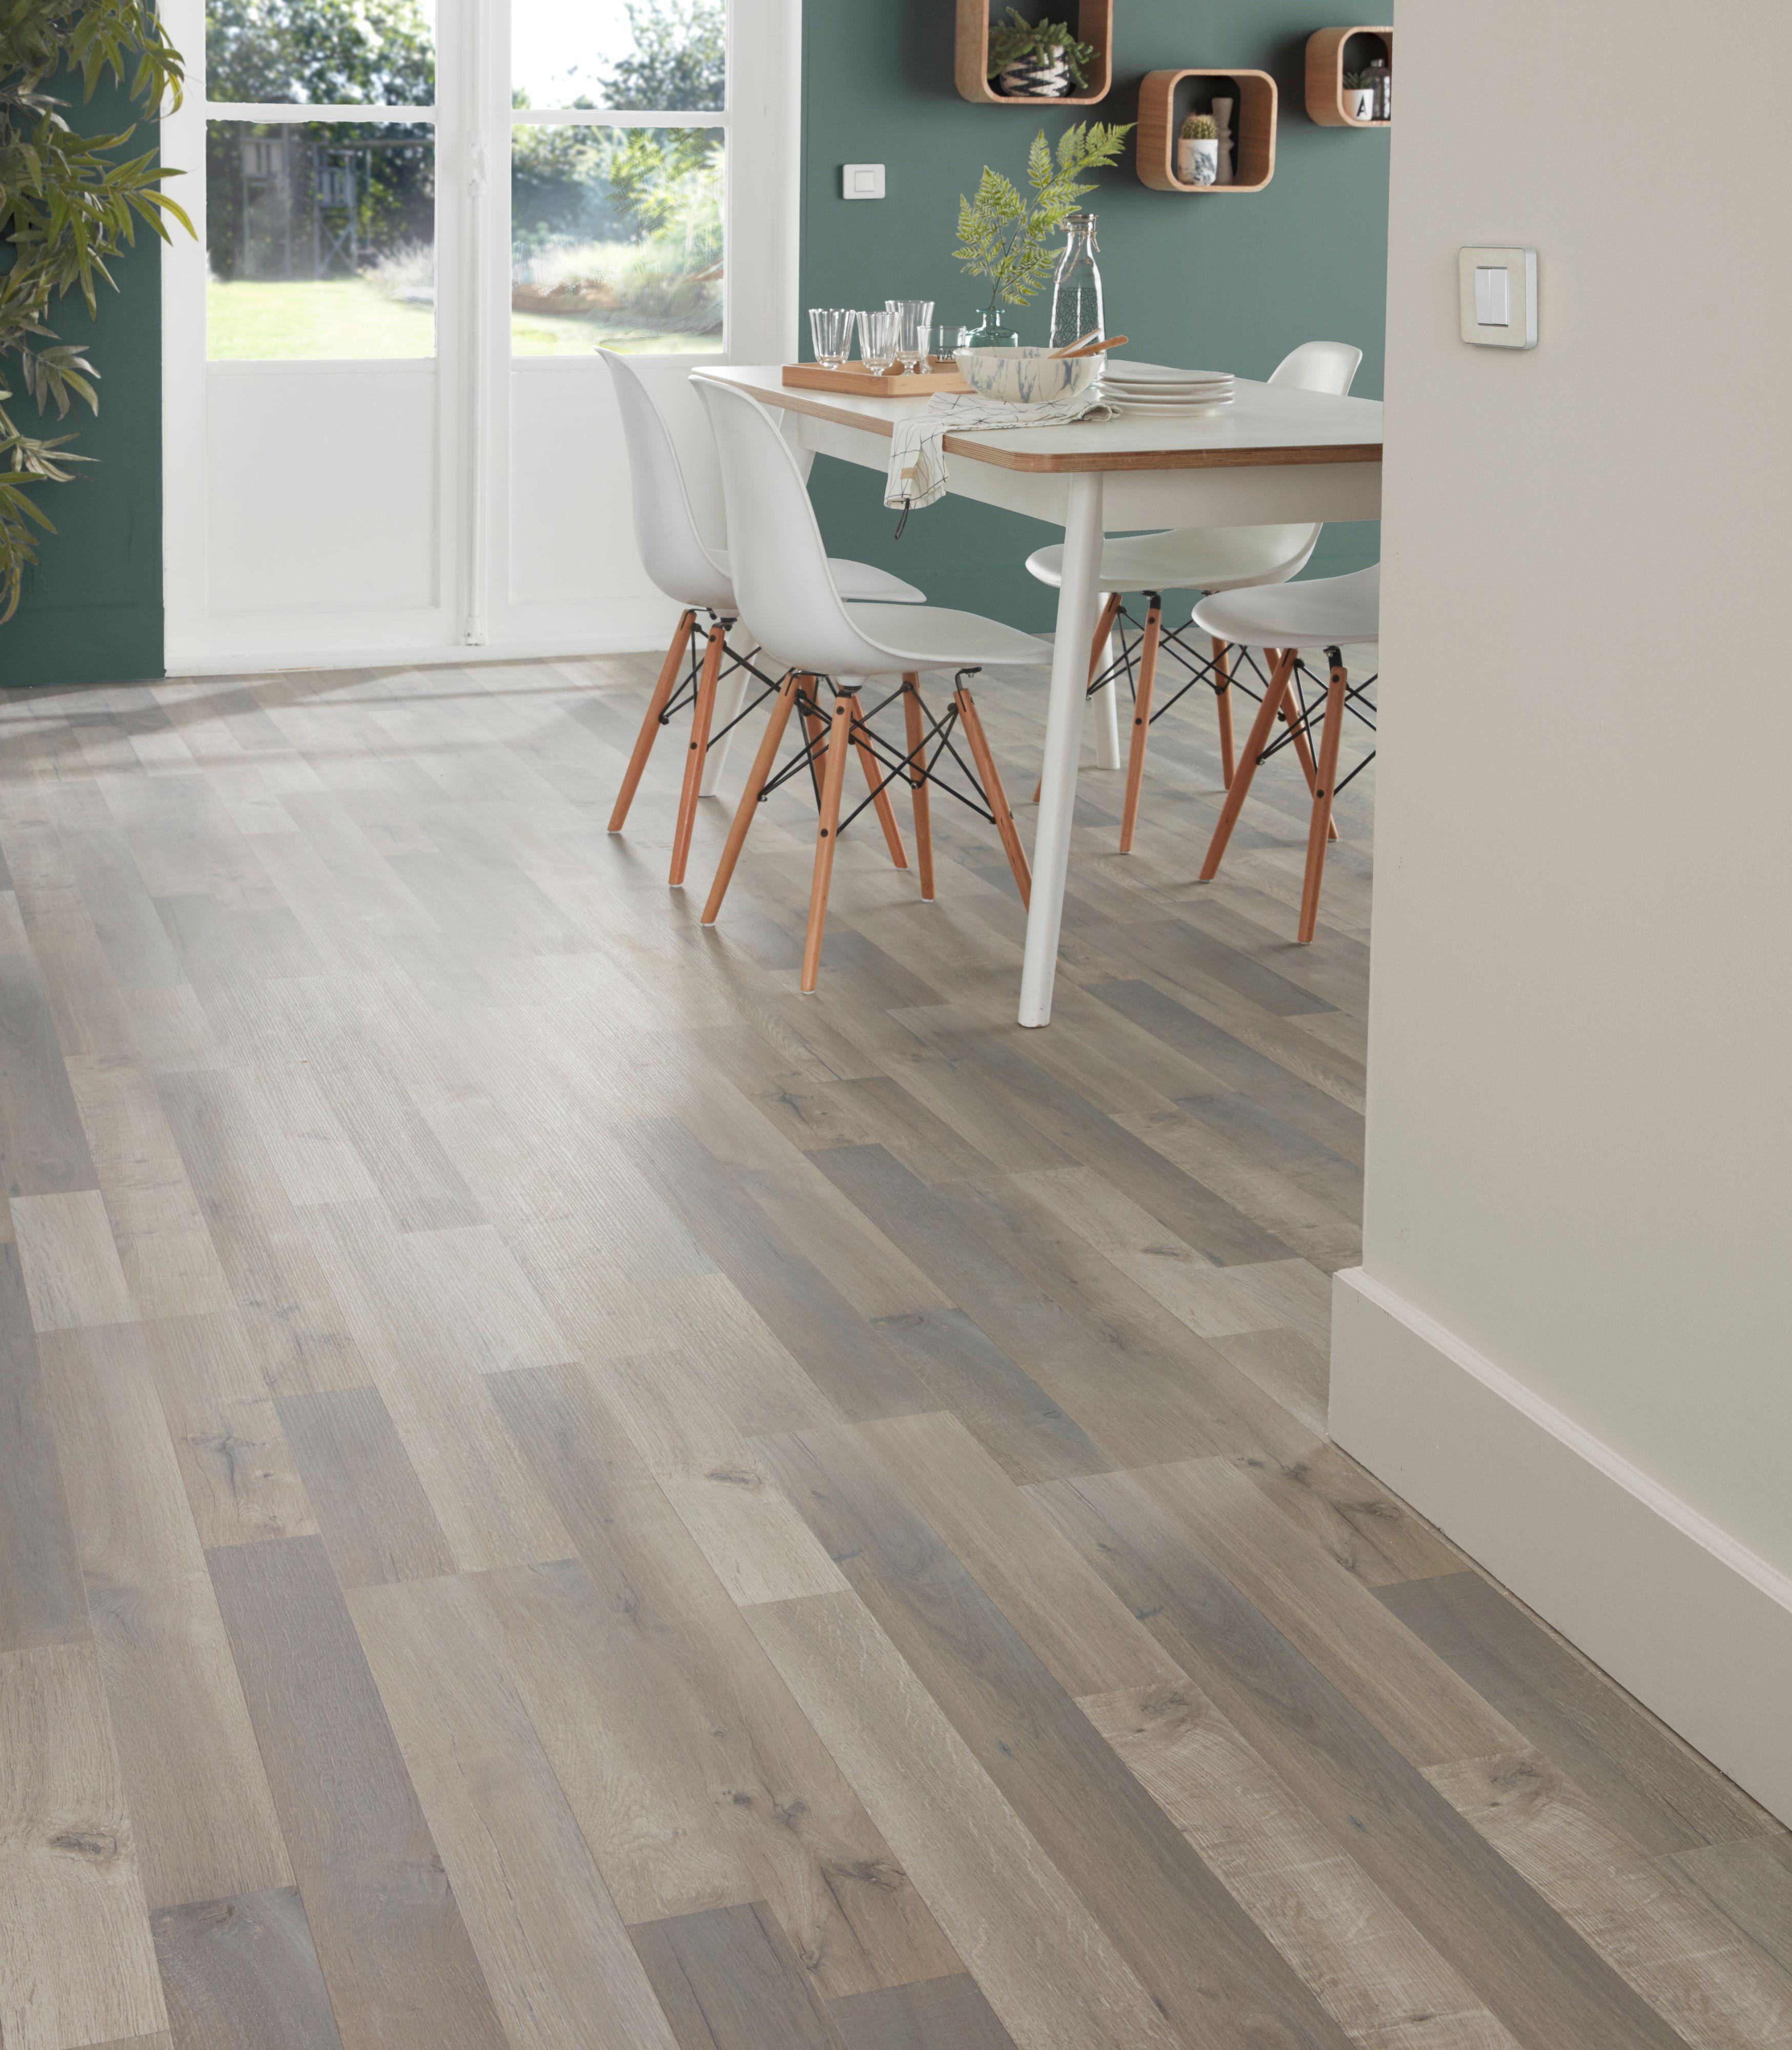 Addington Grey Oak Effect Laminate Flooring 1 996 M² Pack